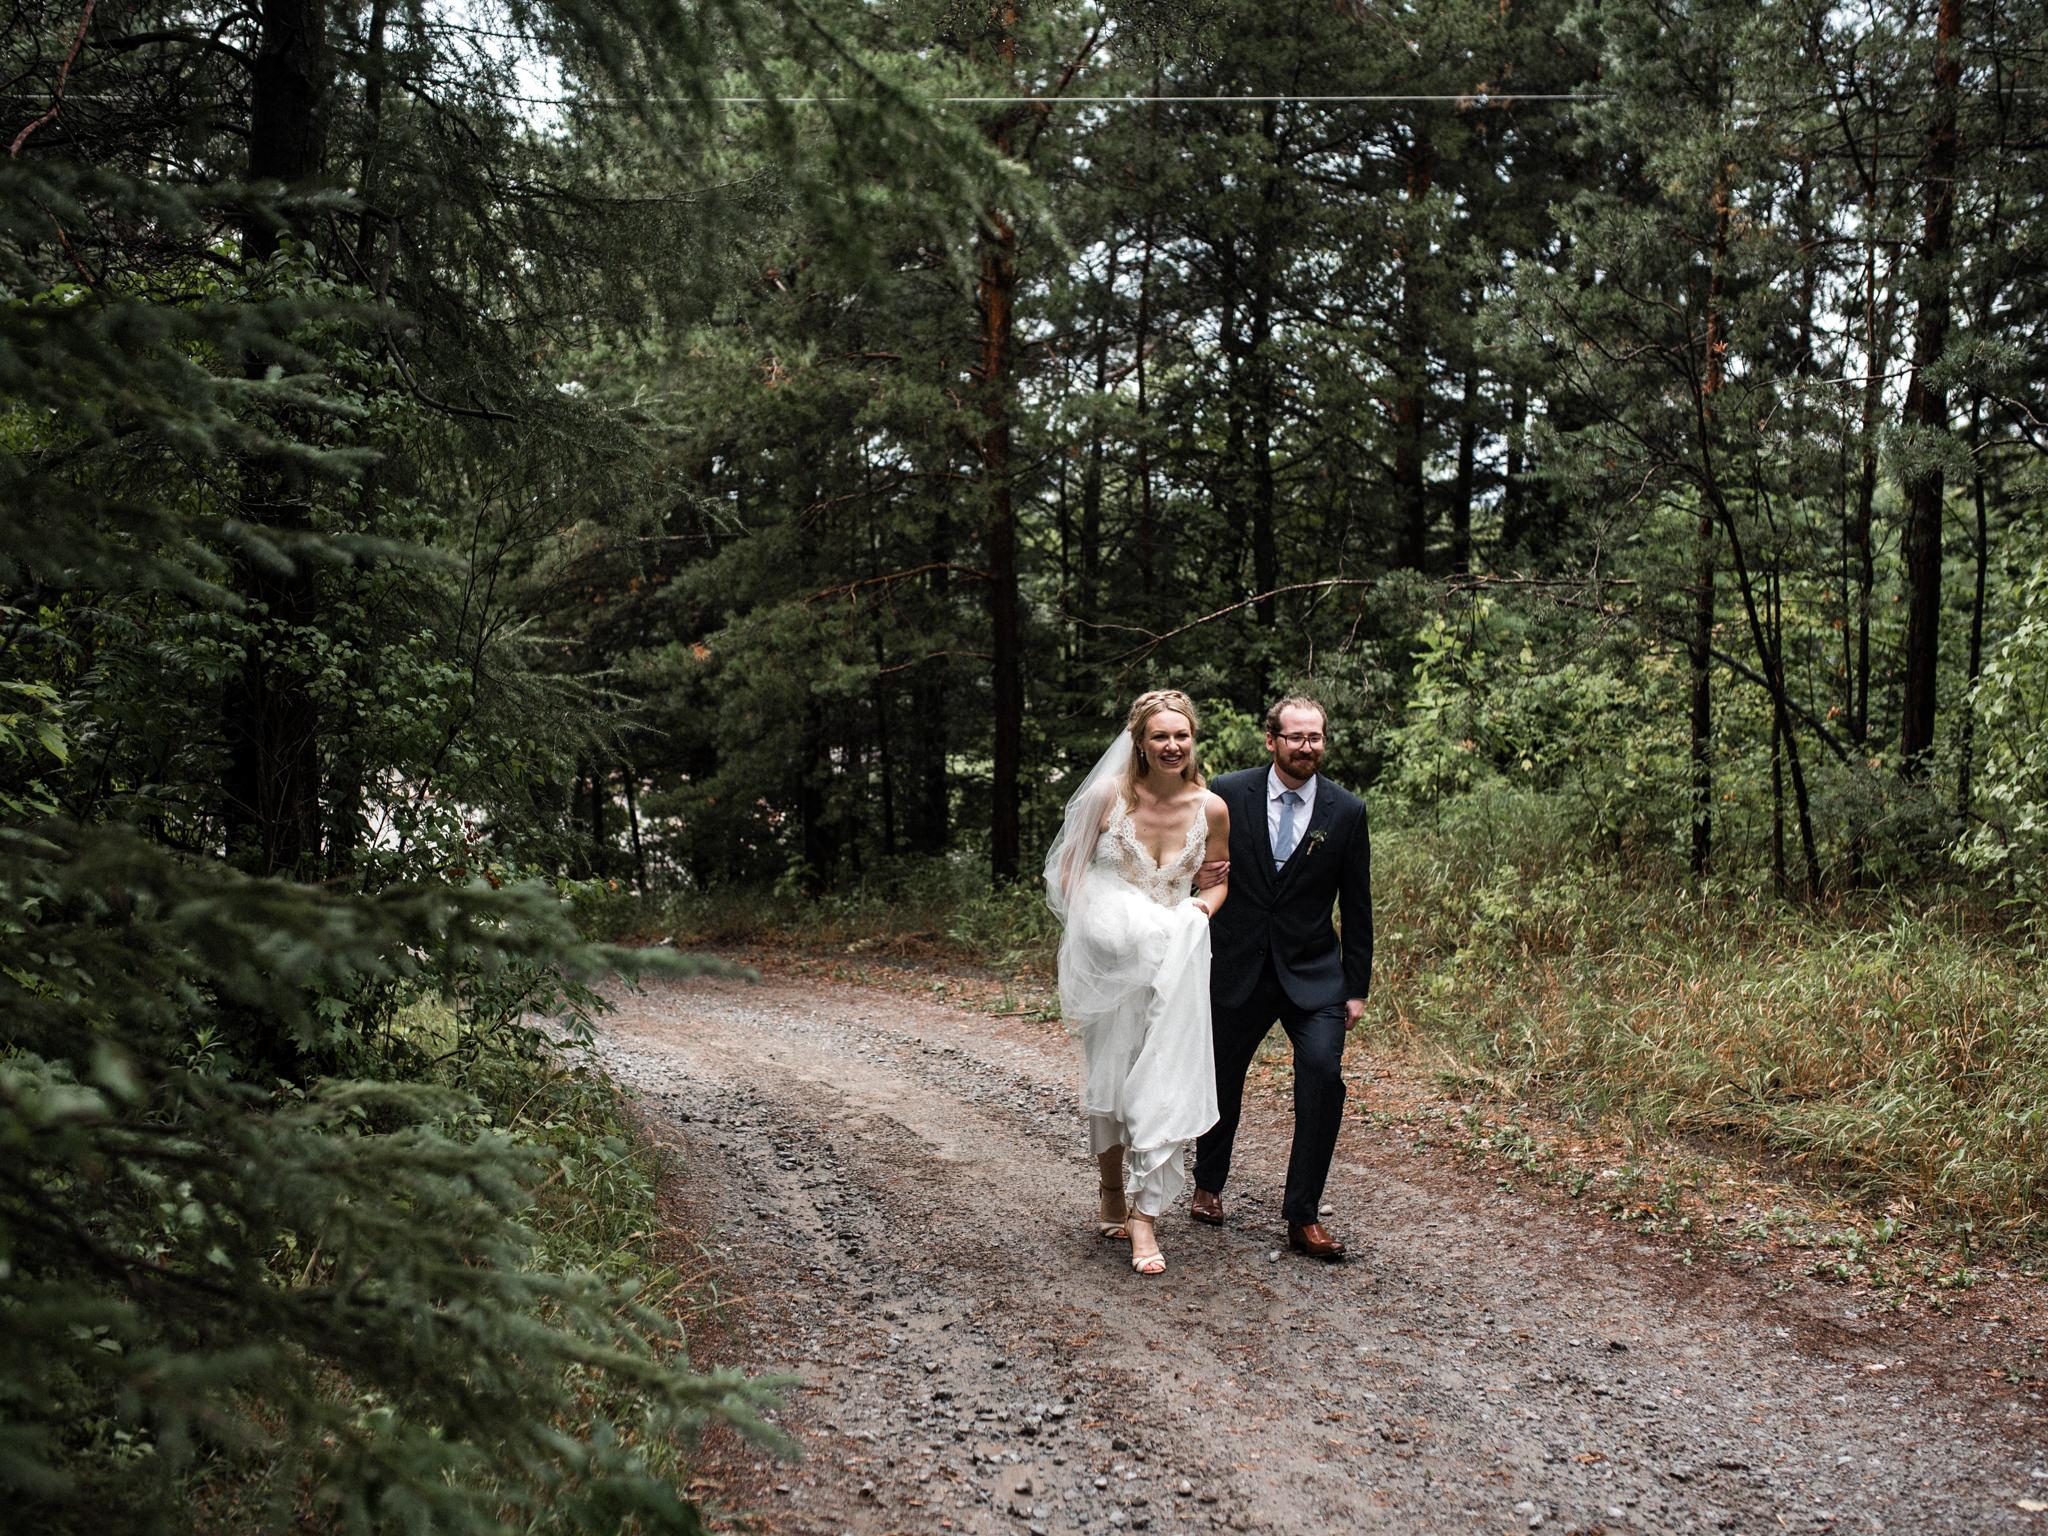 skyloft-wedding-toronto-wedding-photographer-43.jpg